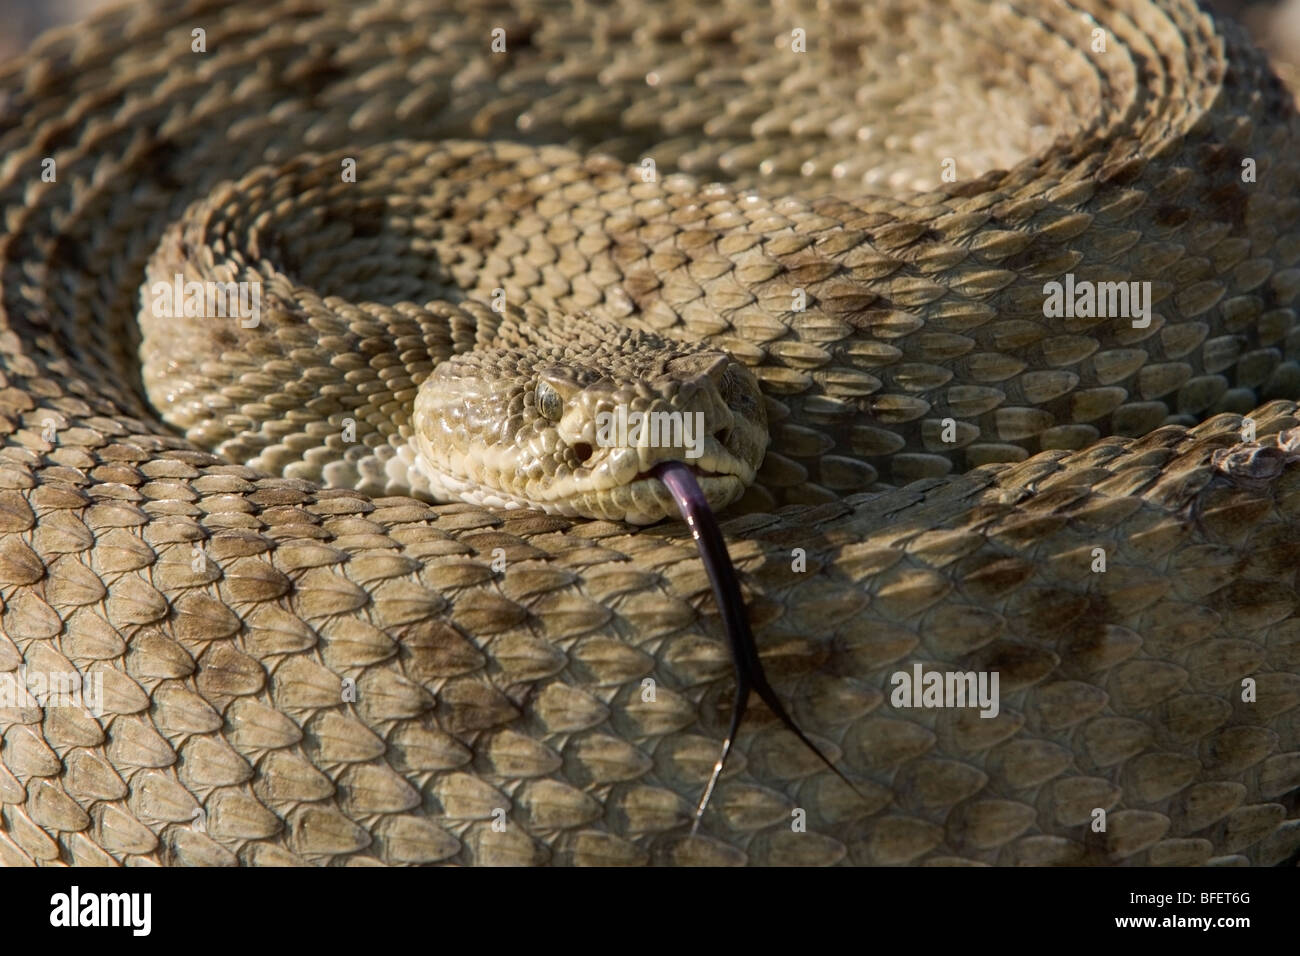 Prairie rattlesnake (Crotalus viridis), Grasslands National Park, Saskatchewan, Canada - Stock Image